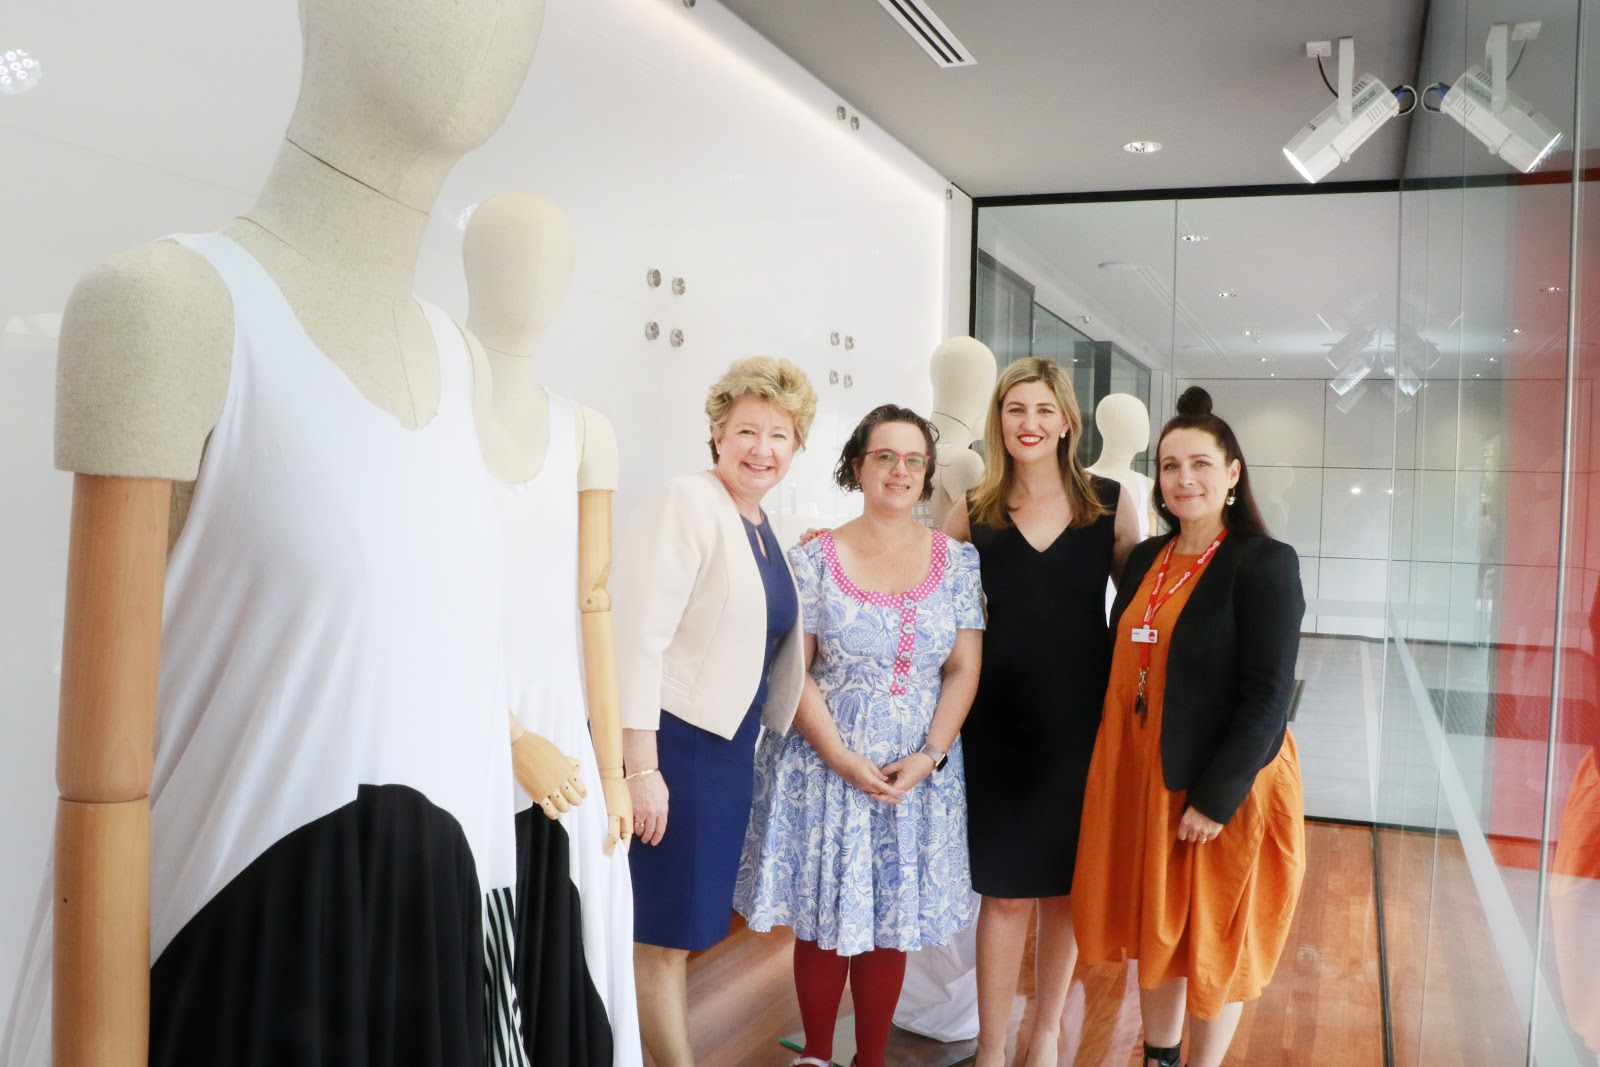 TAFE Queensland DesignTech Precinct